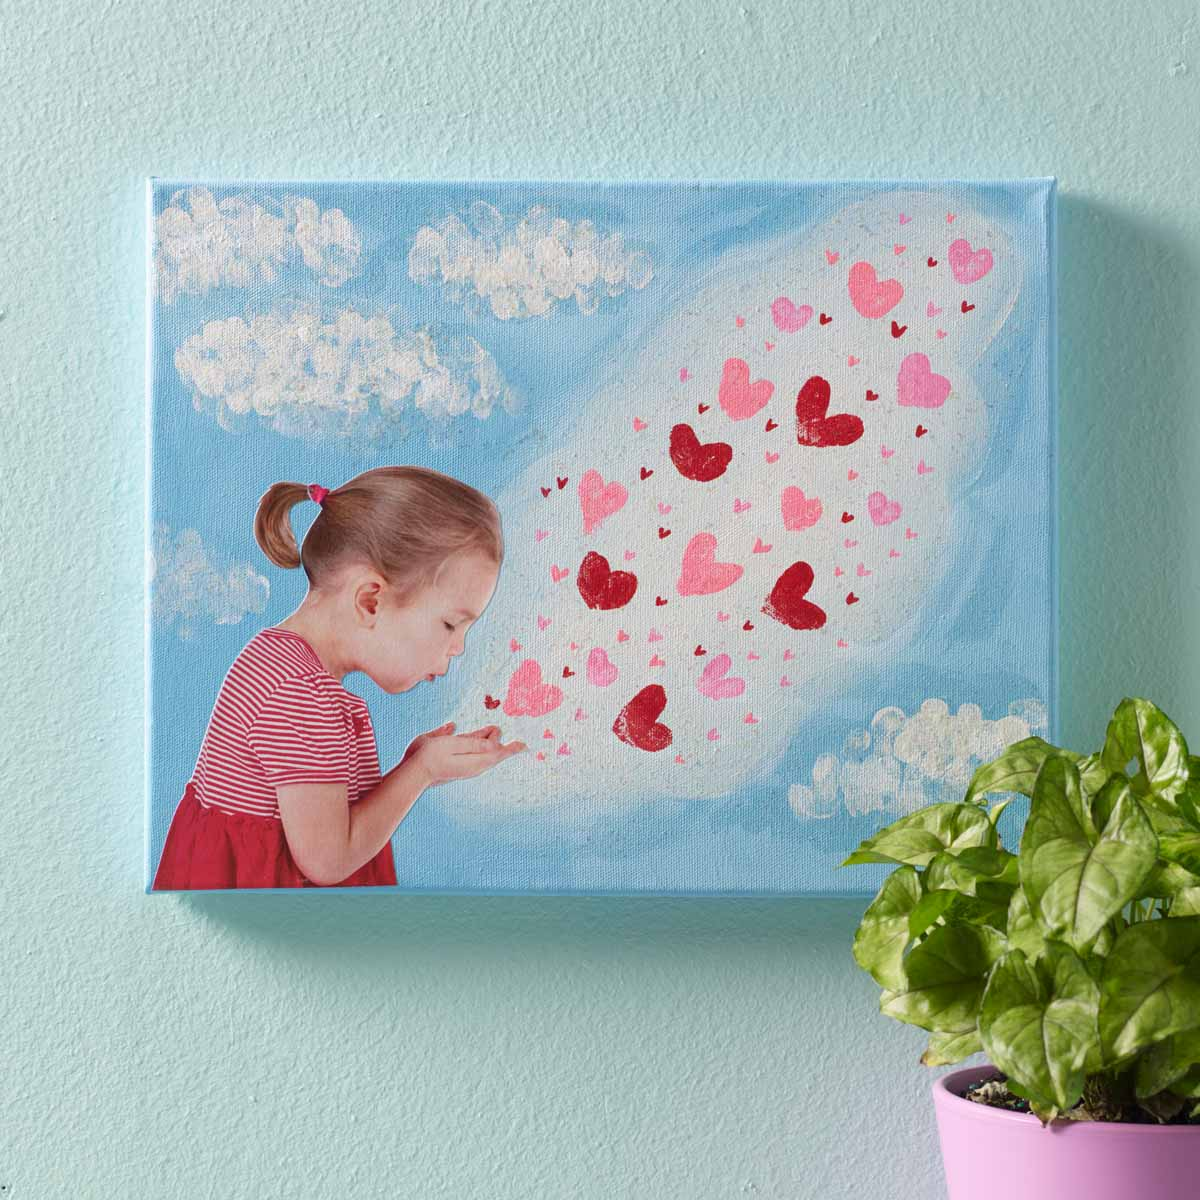 Blowing Kisses to Grandma Canvas